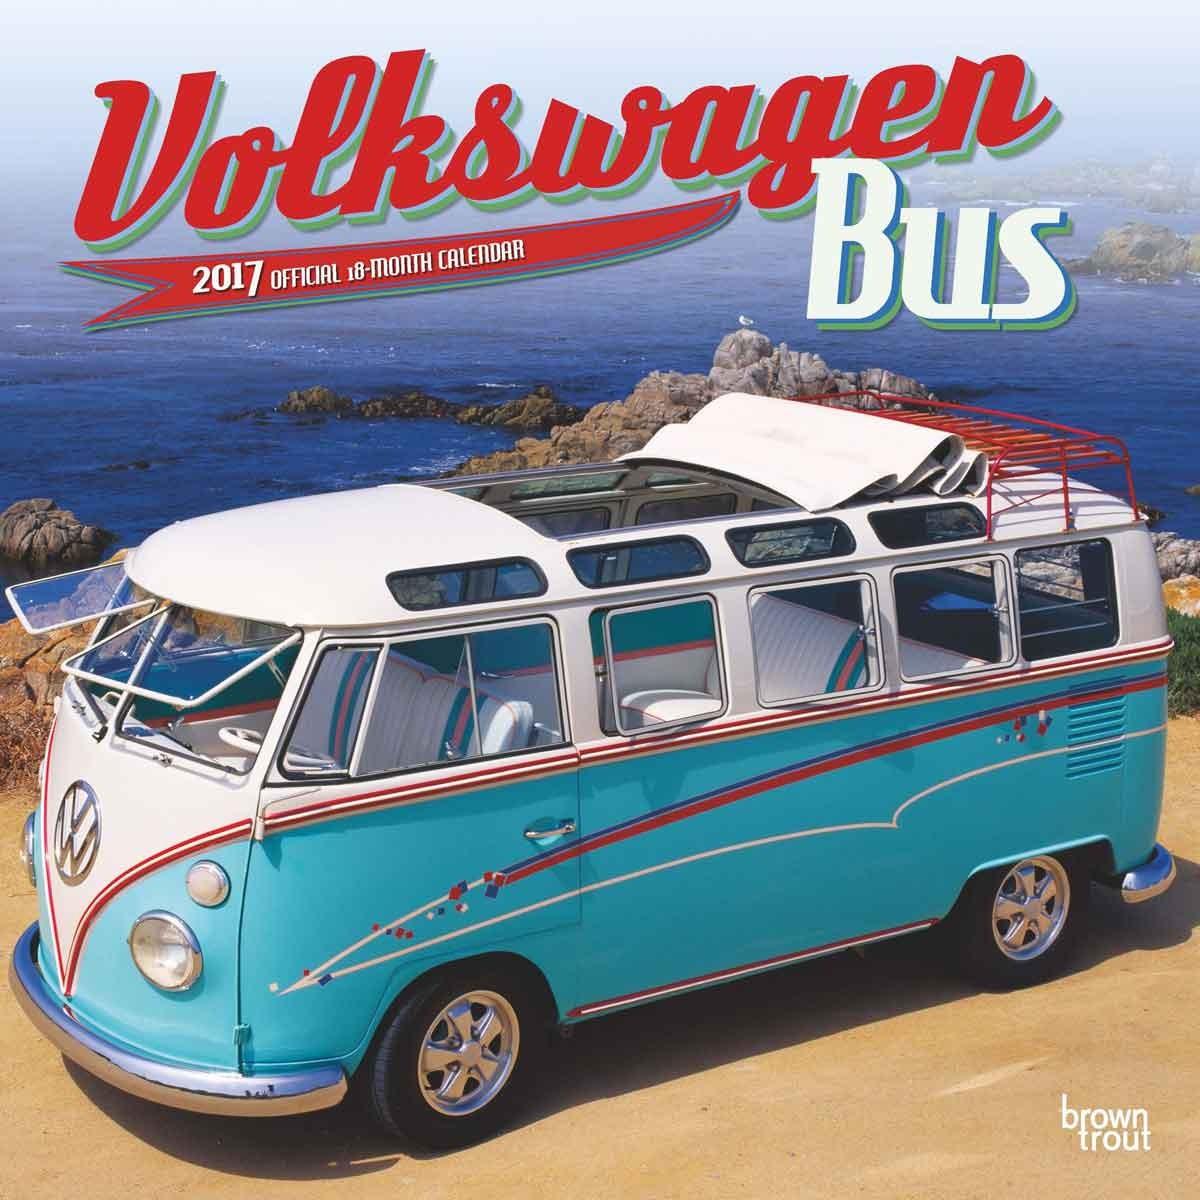 Volkswagen Bus Kalendarz 2018 Kup Na Posters Pl